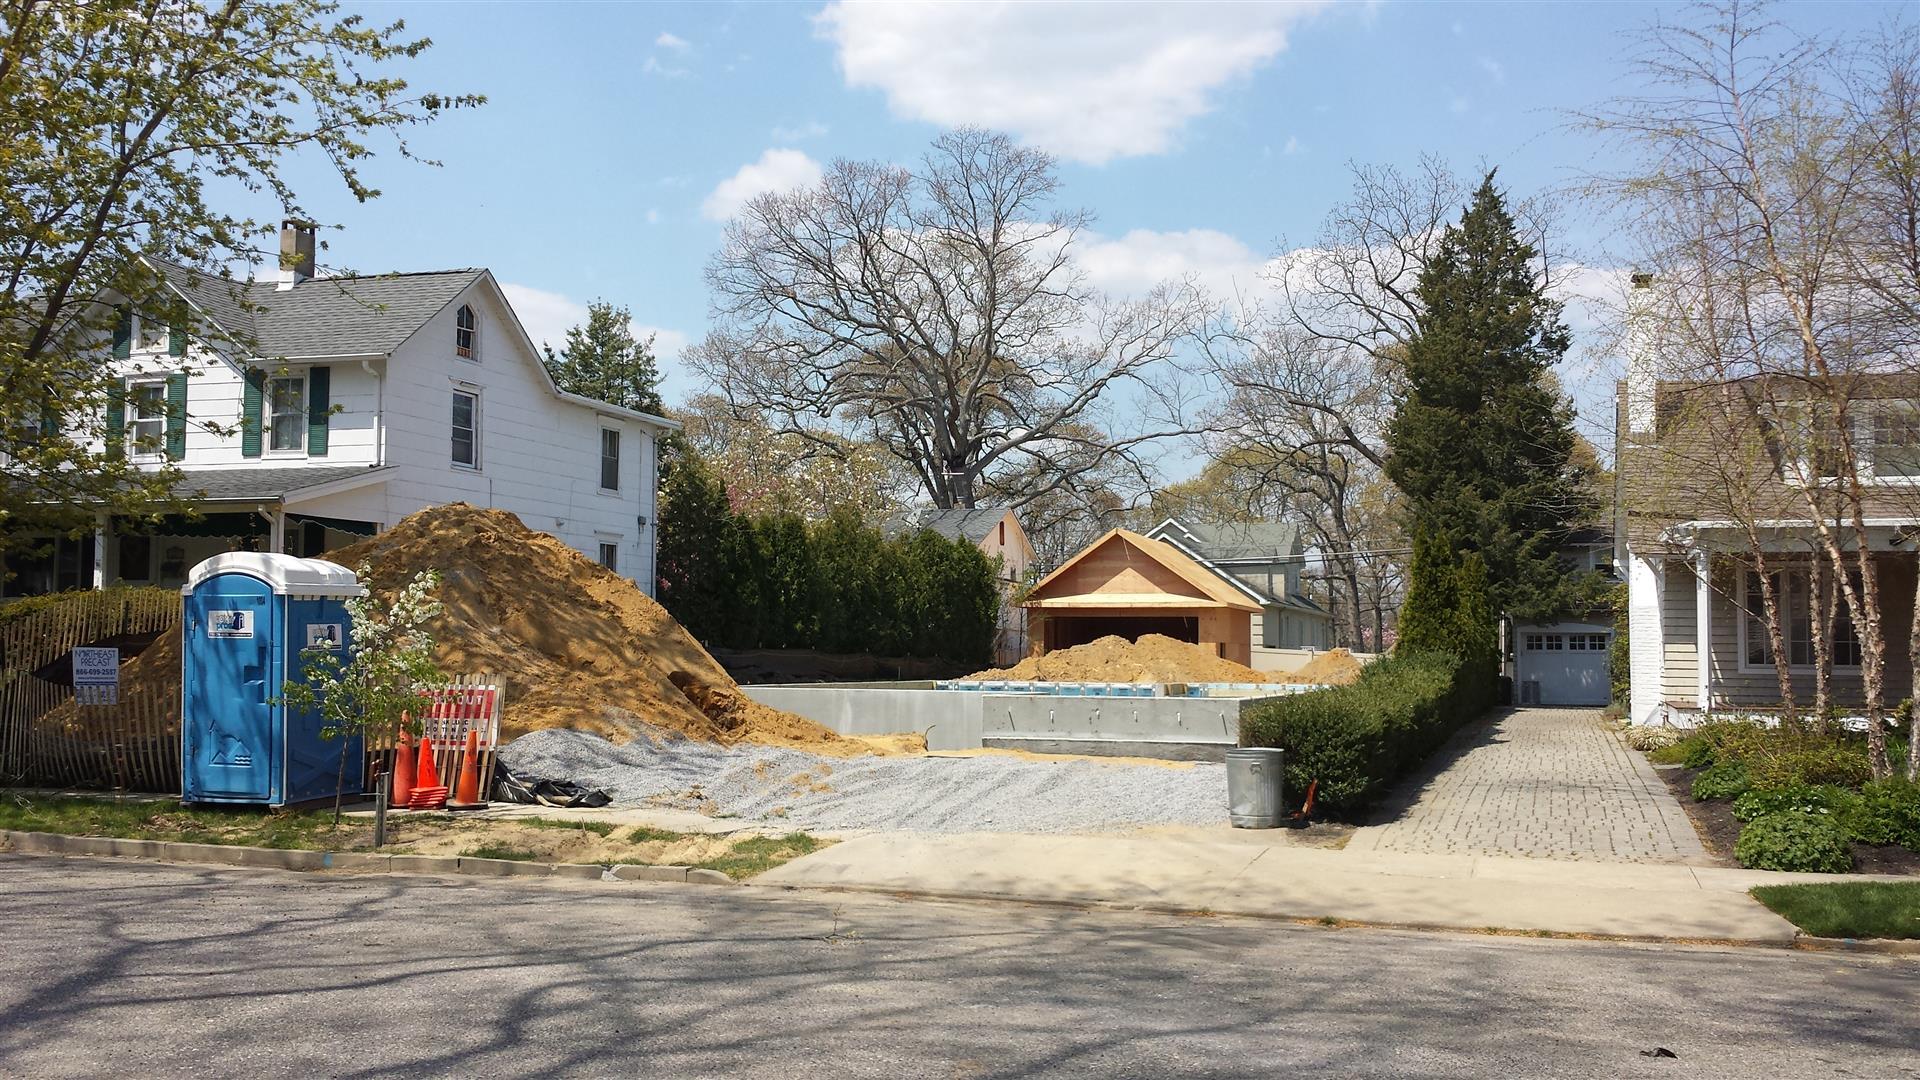 2015-05-04 Construction begins